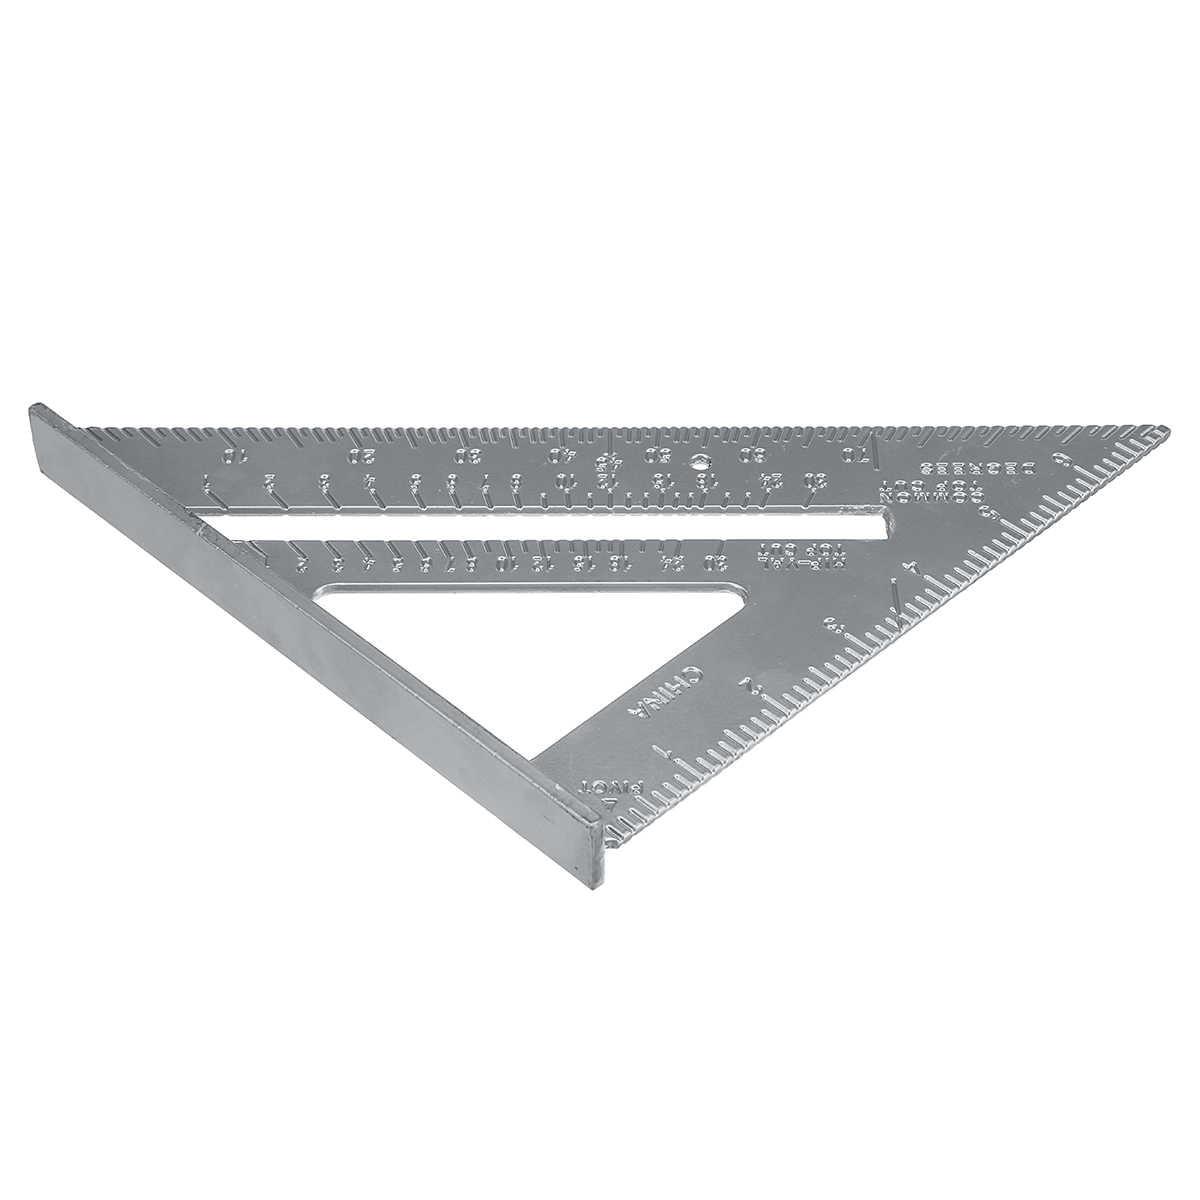 ZEAST 7 インチアルミ合金測定定規速度正方形屋根トライアングルアングル分度器トランメル測定ツール